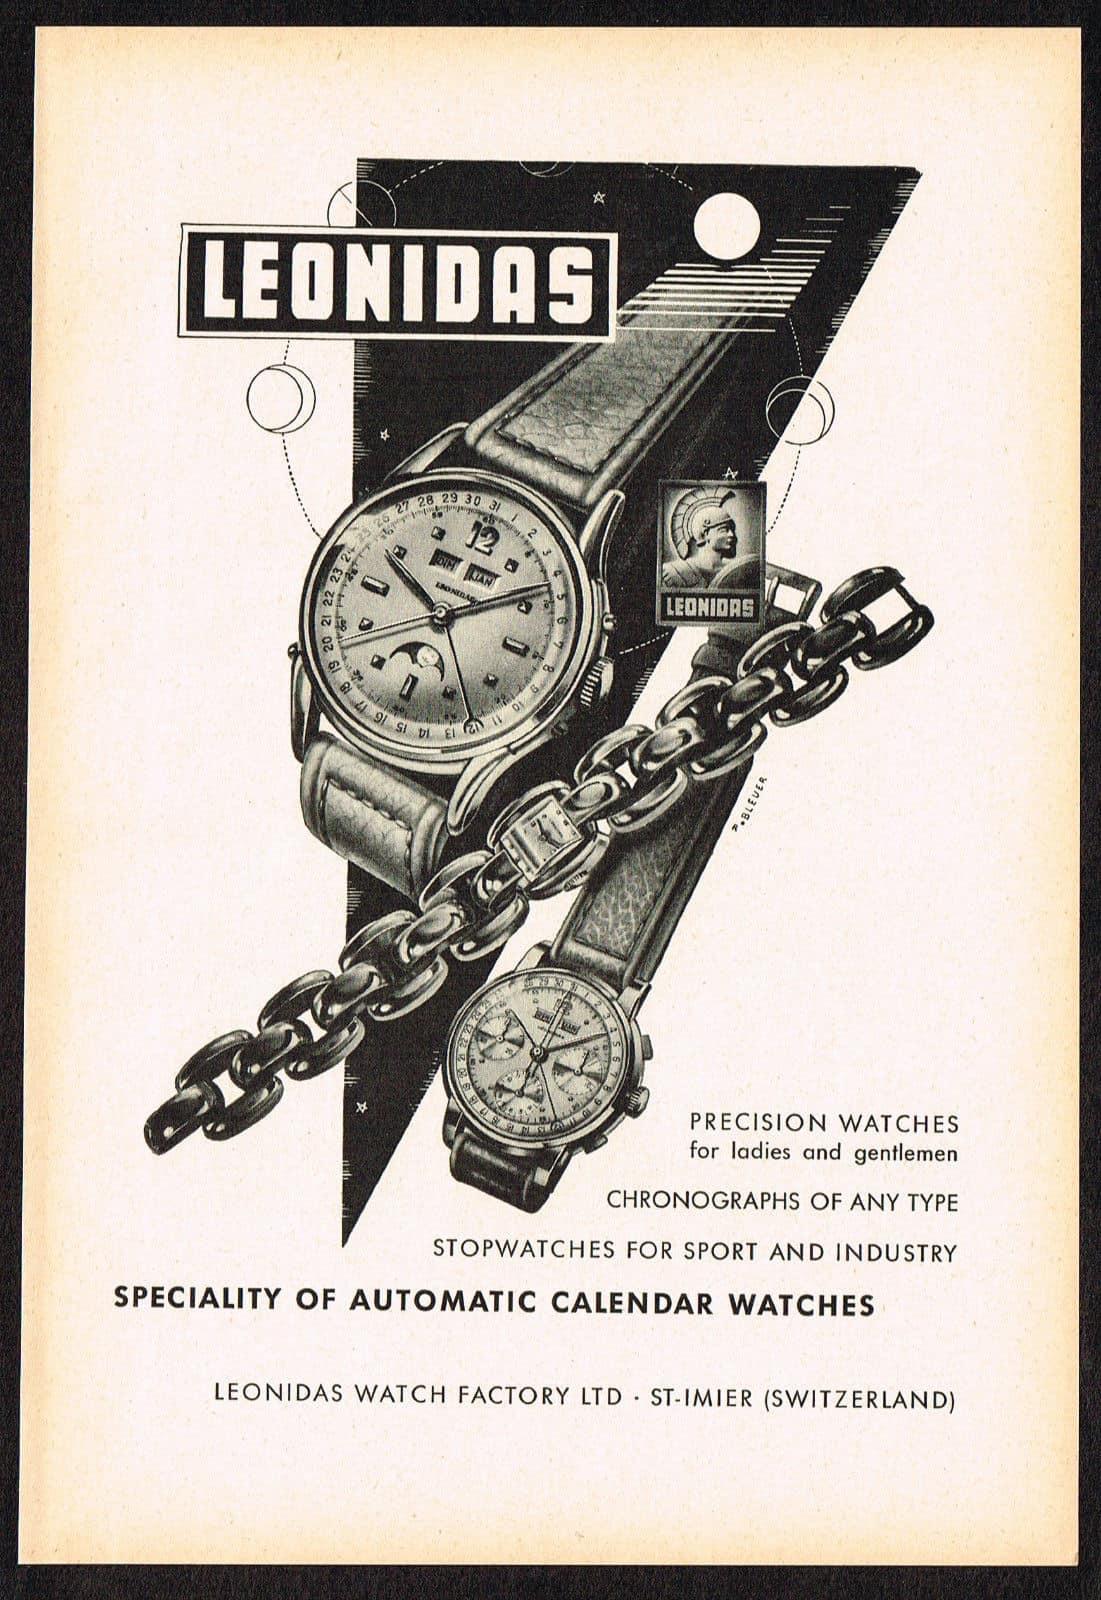 Old Leonidas advertisment